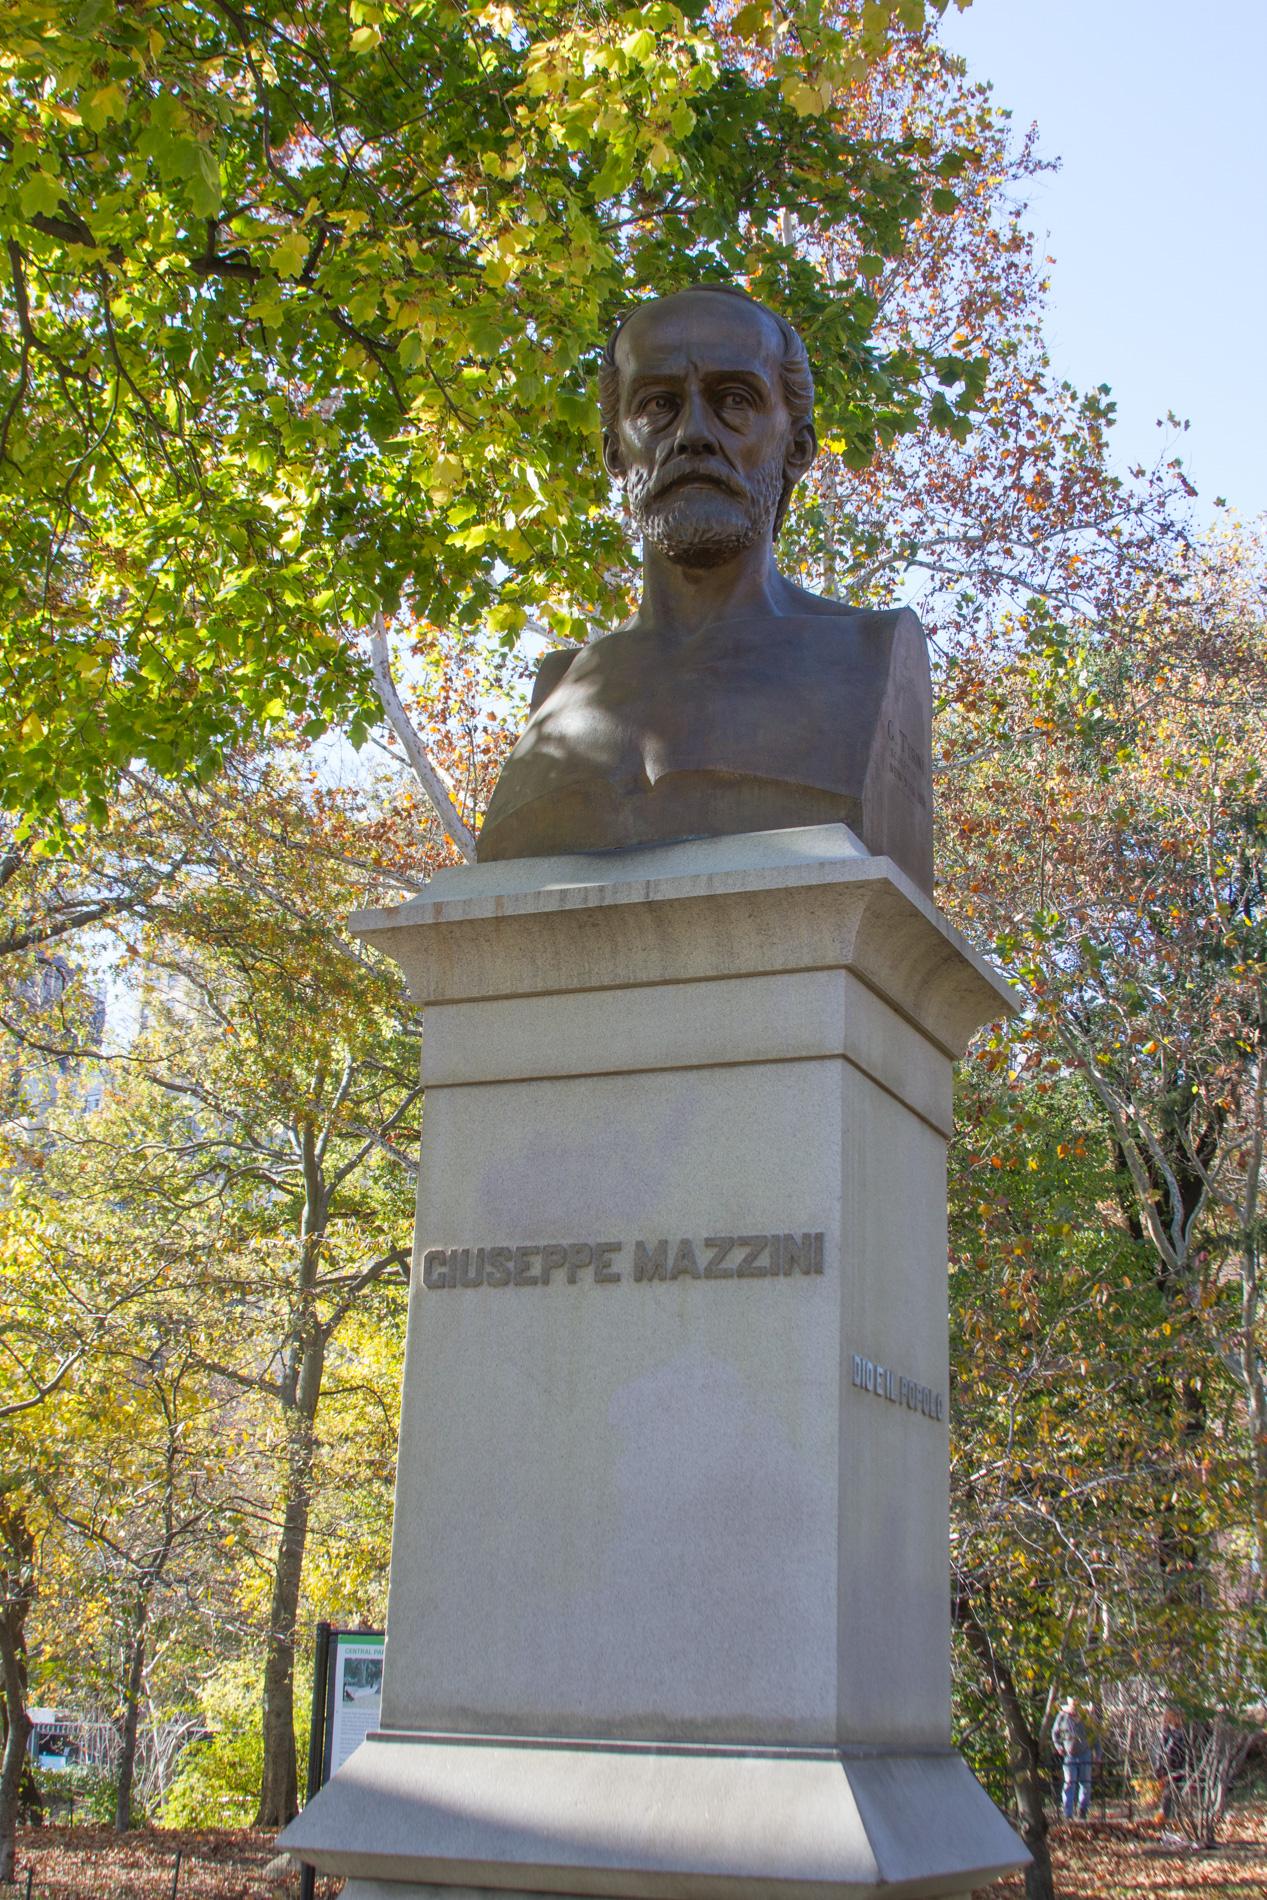 Giuseppe Mazzini [4101]